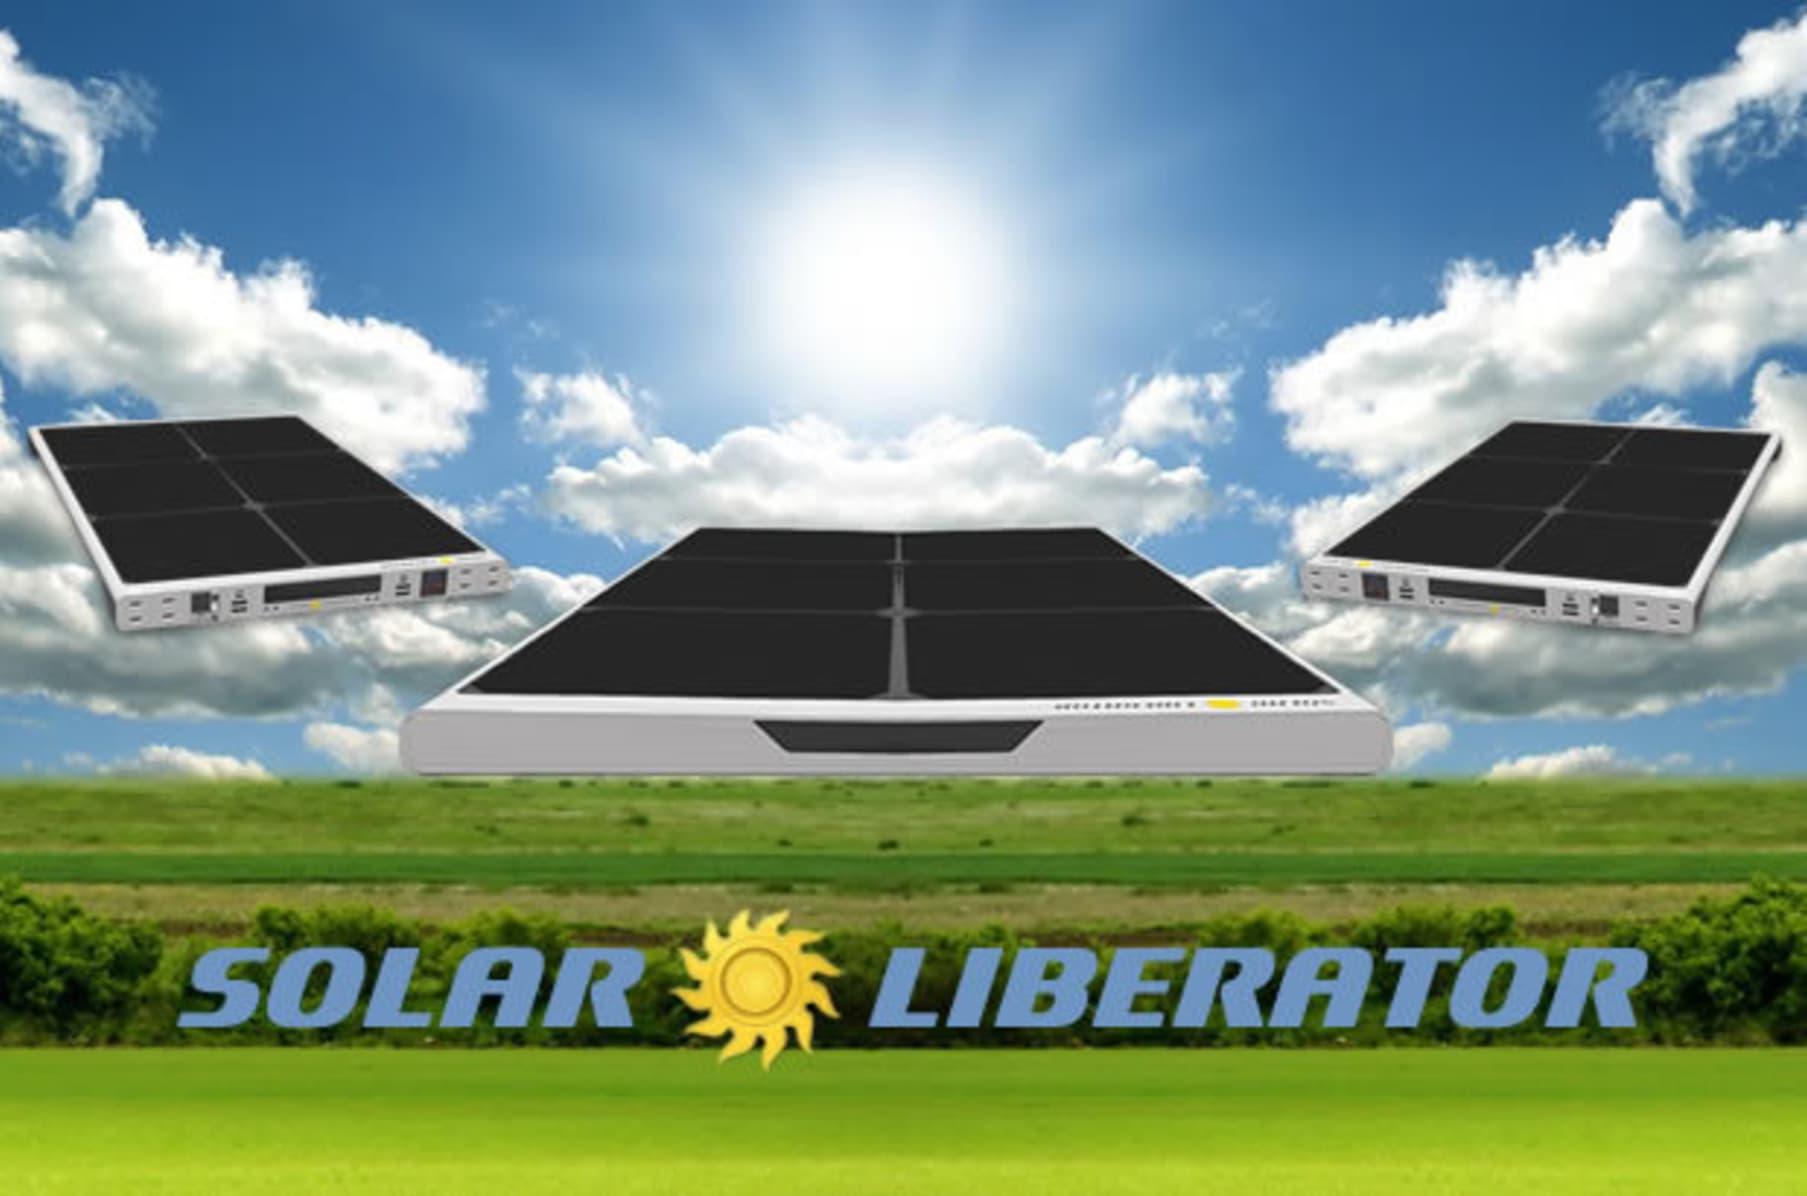 Solar Liberator Indiegogo